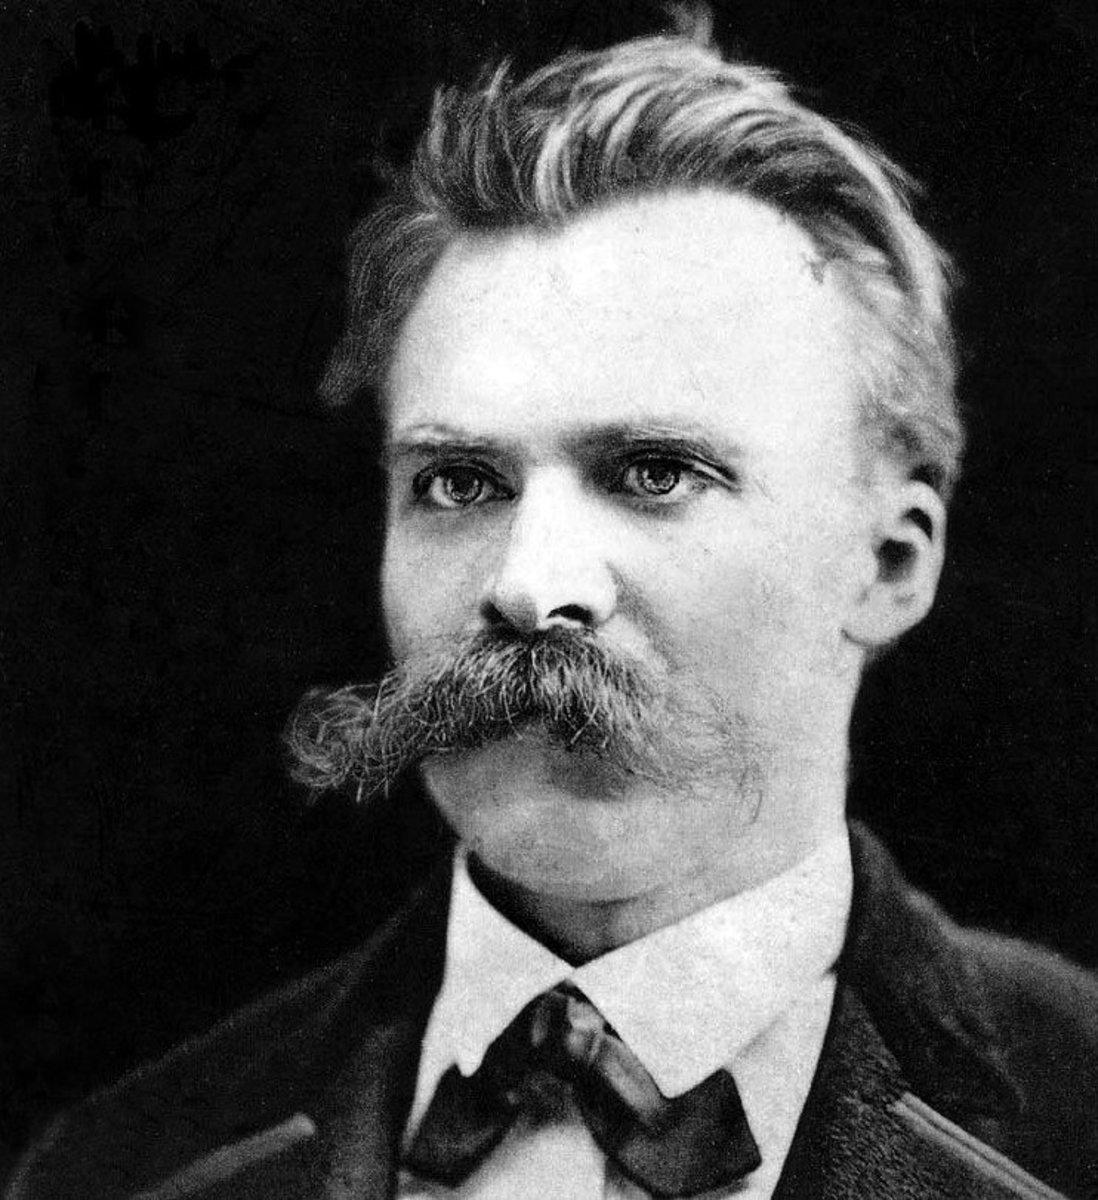 Famous Philosophers: What Did Friedrich Nietzsche Believe?